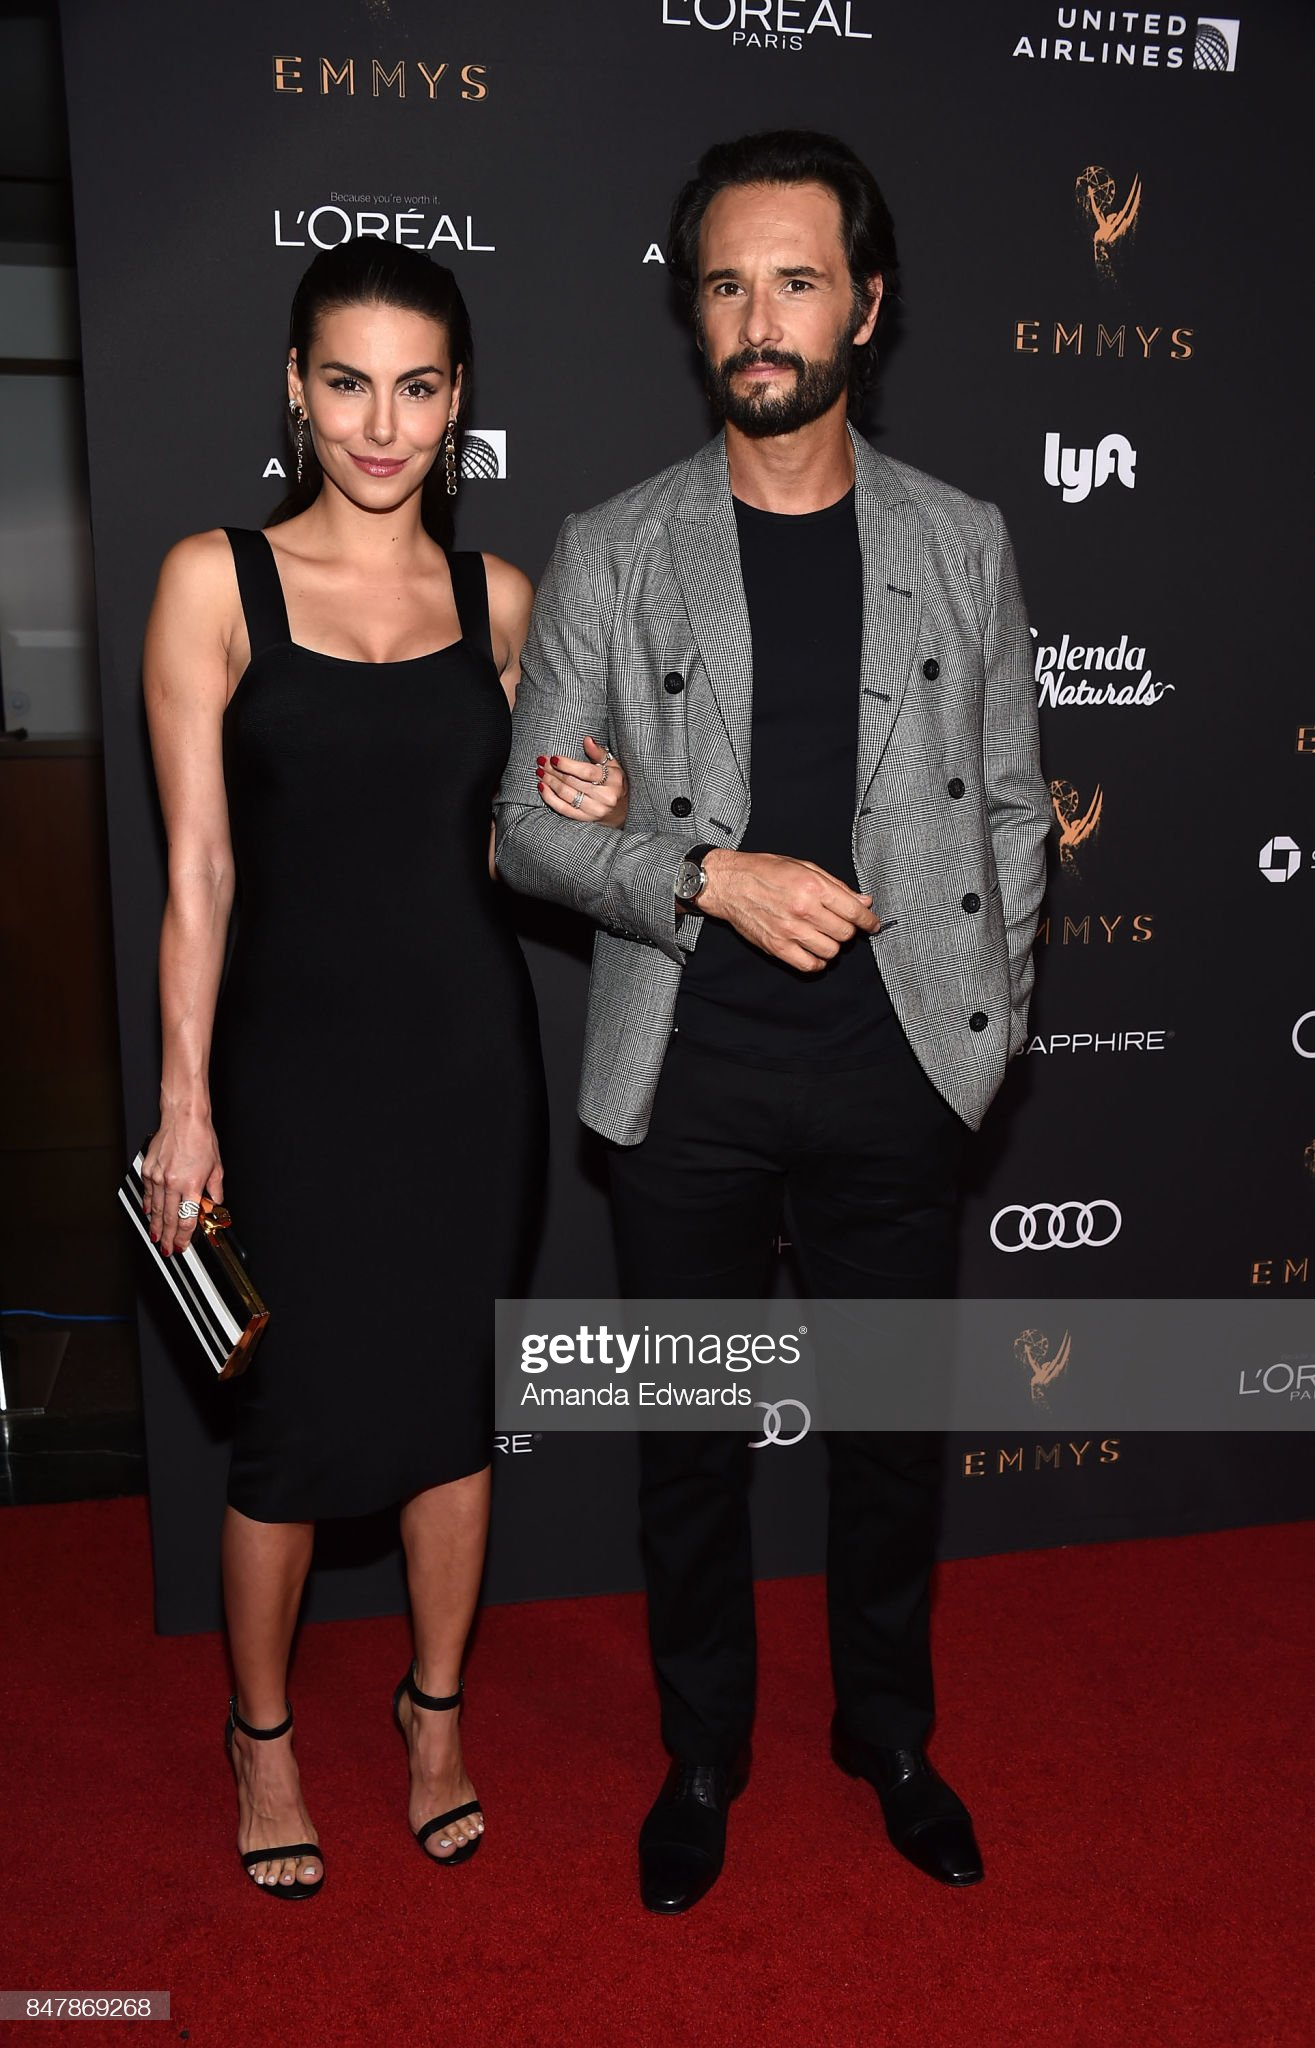 ¿Cuánto mide Rodrigo Santoro? - Altura - Real height Actor-rodrigo-santoro-and-actress-mel-fronckowiak-arrive-at-the-picture-id847869268?s=2048x2048